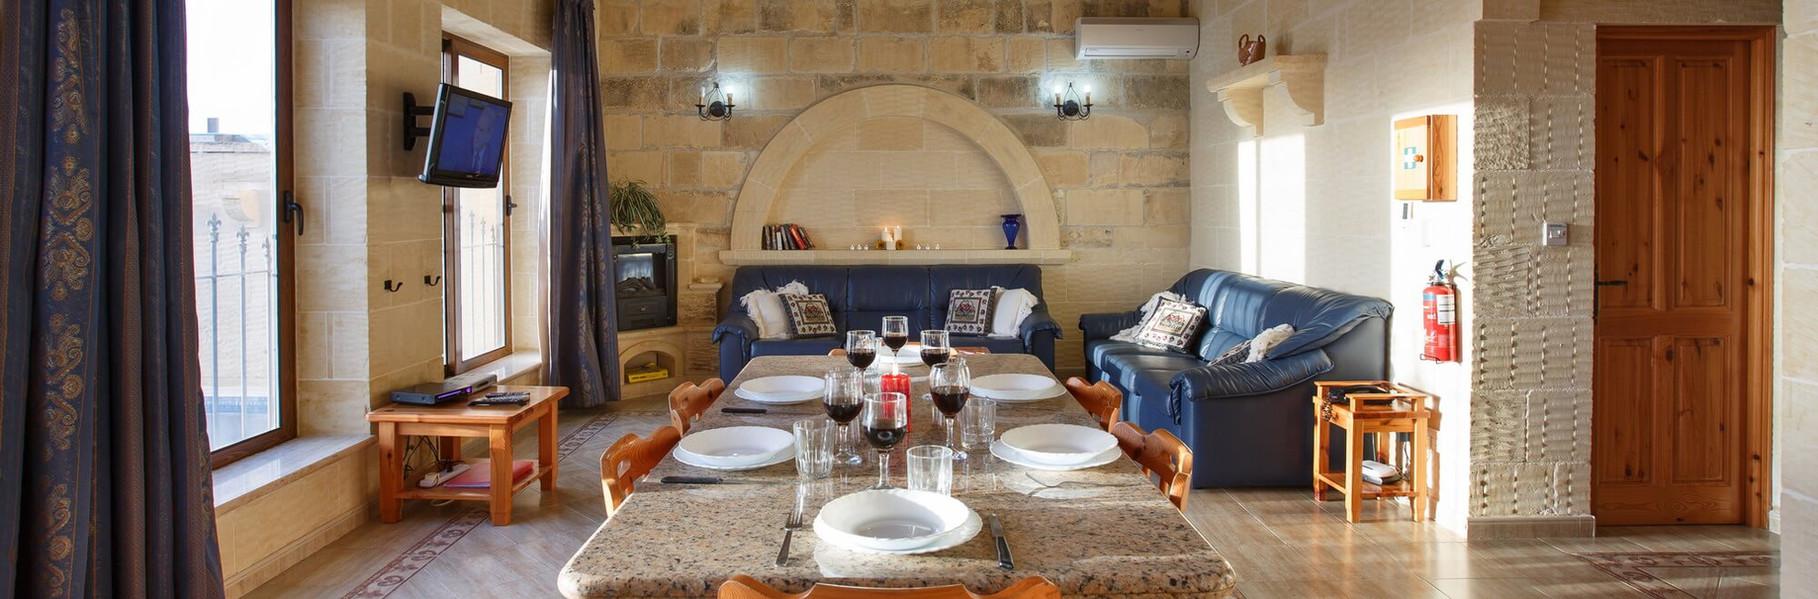 farmhouse-living-dining-4.jpg